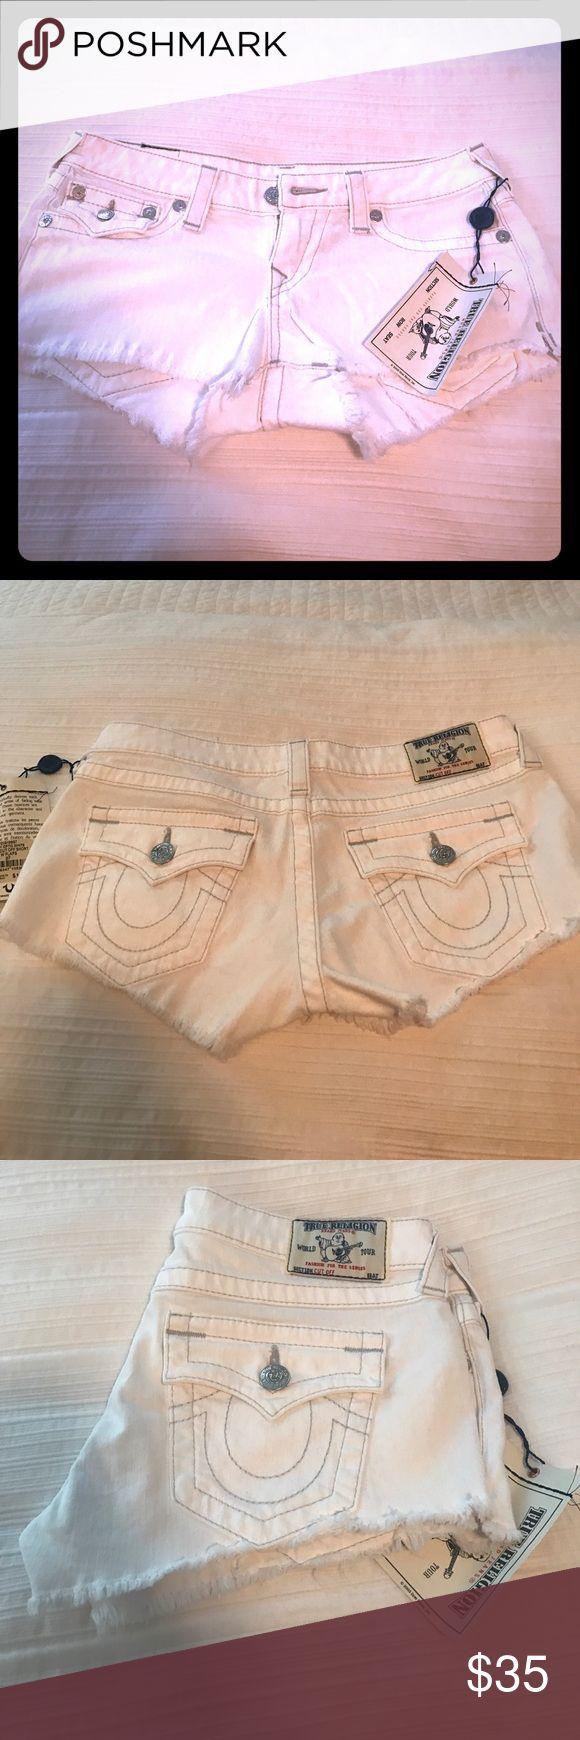 True Religion White cutoff jean shorts NWT True Religion White cutoff jean shorts NWT size 27 True Religion Shorts Jean Shorts